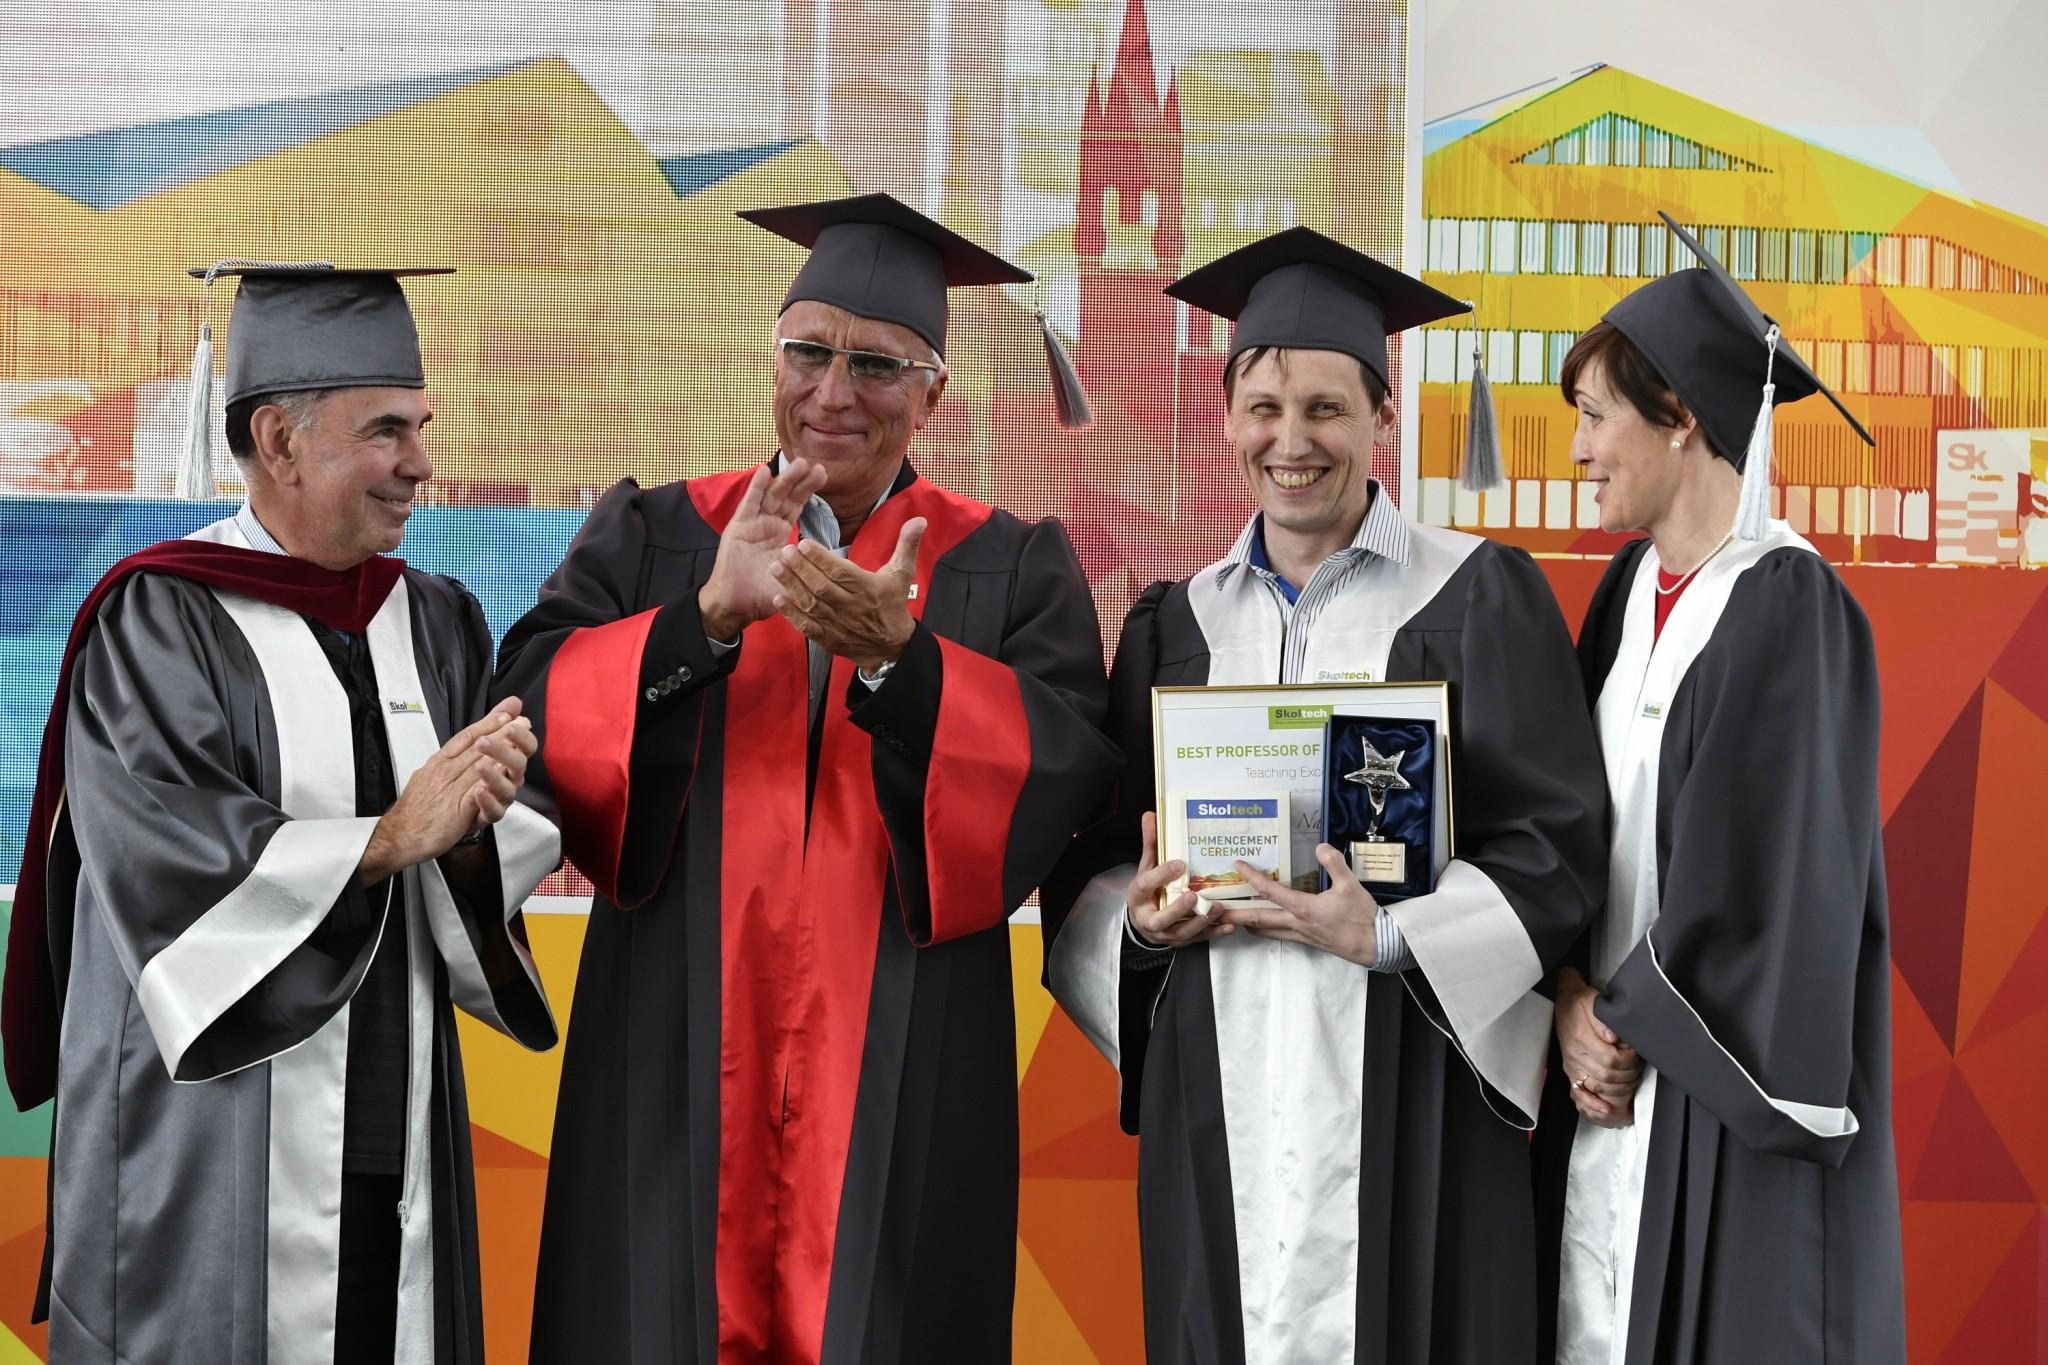 From left: Skoltech Founding President Crawley, Skoltech President Kuleshov, Professor Nasibulin and Dean of Education Derevnina. Photo: Skoltech